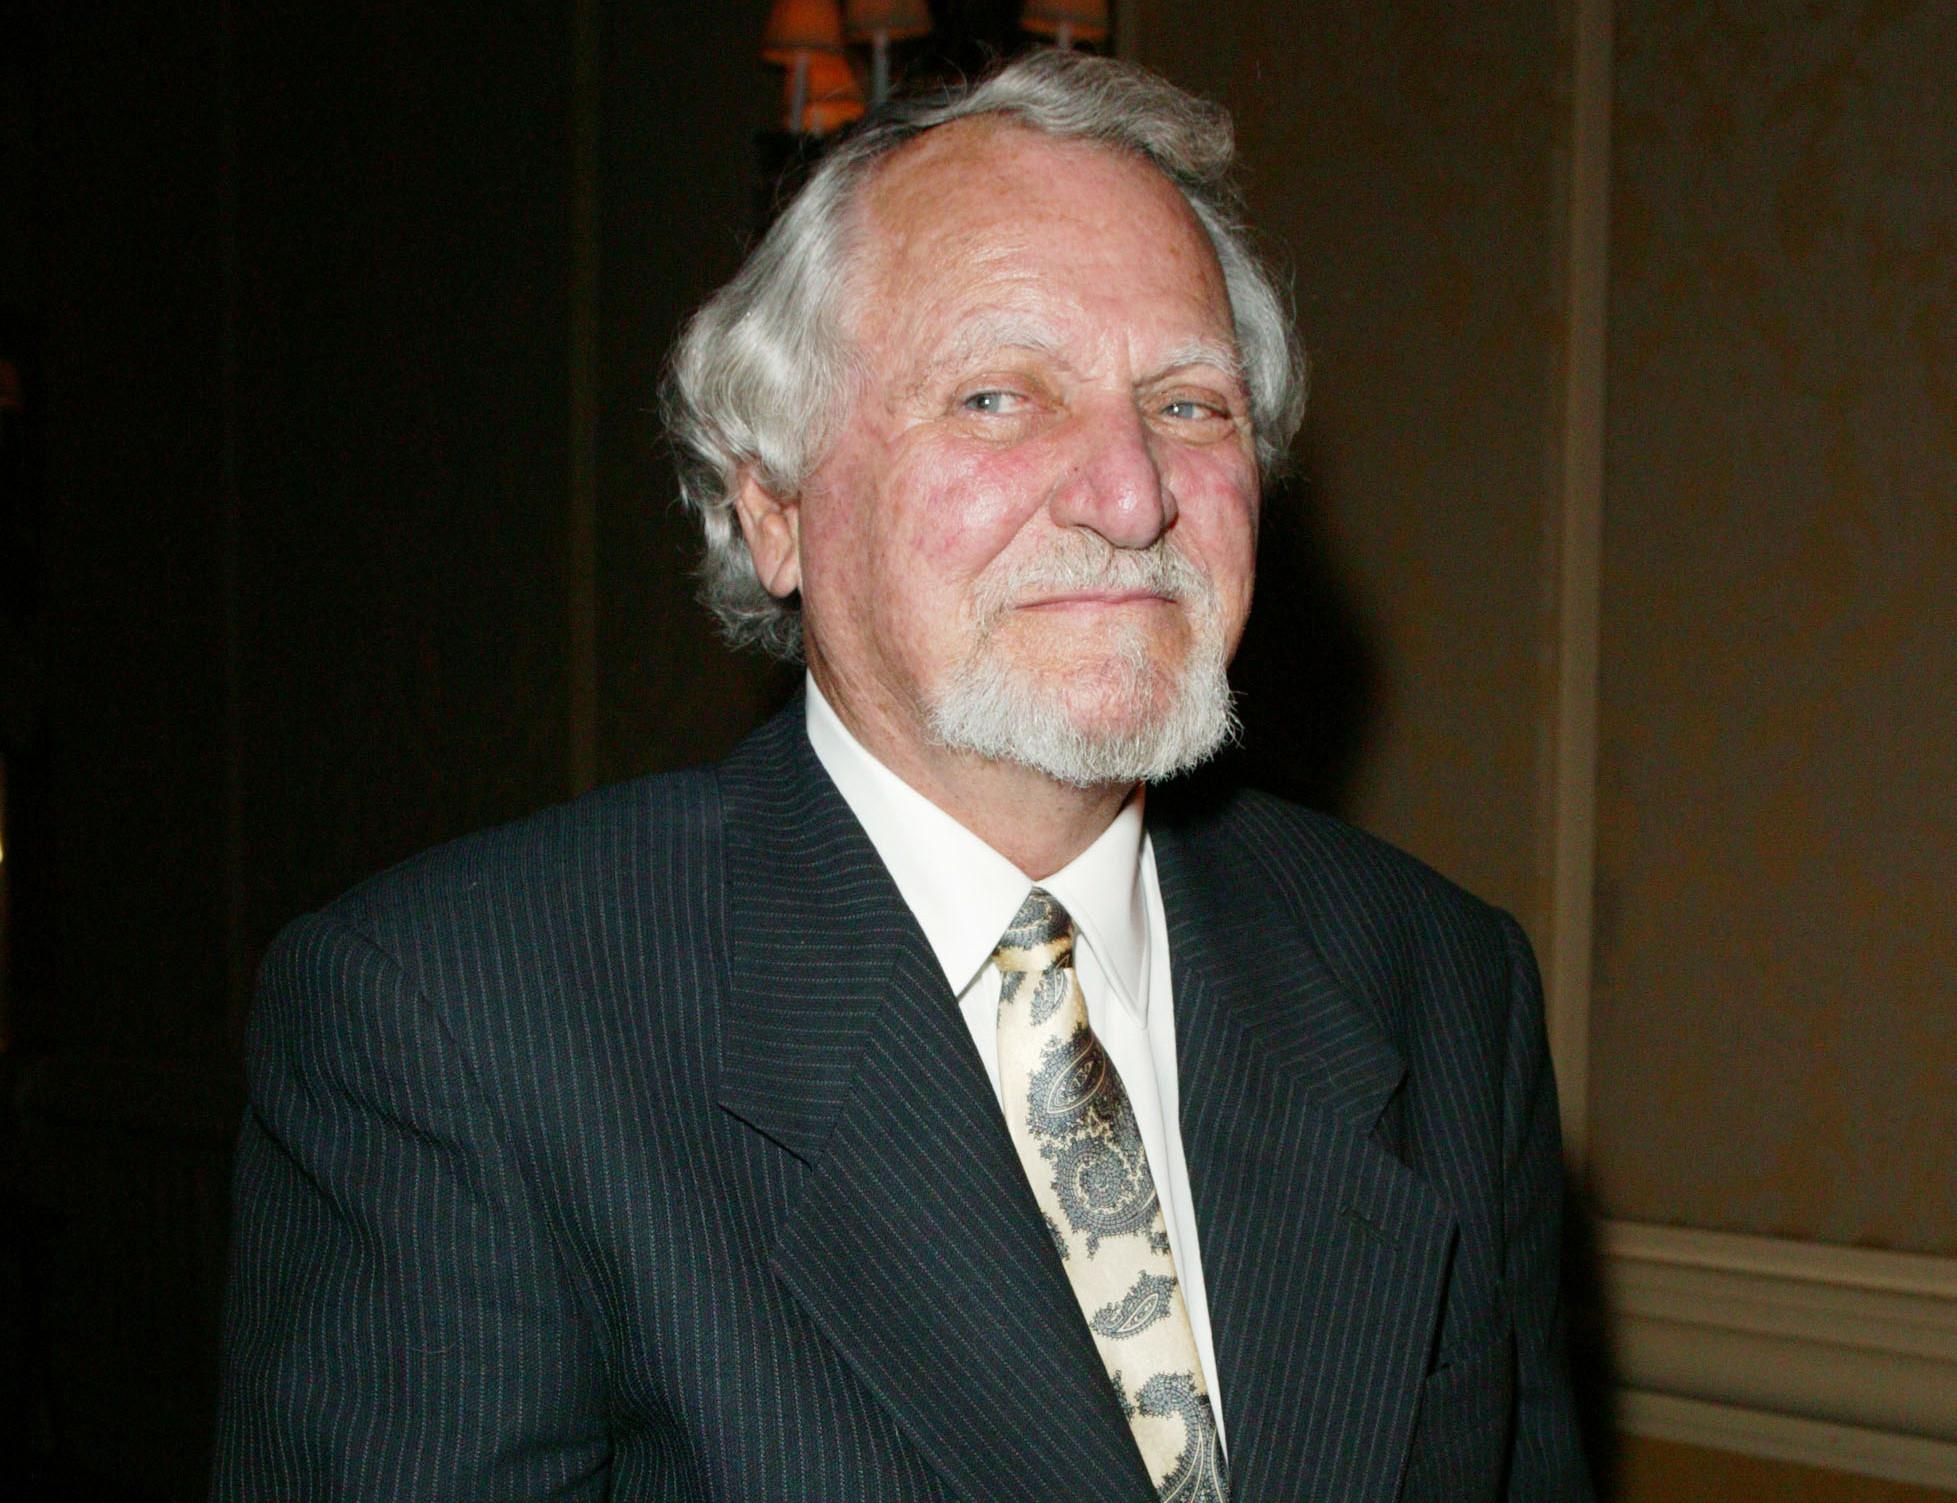 Clive Cussler, best-selling author behind Dirk Pitt adventure novels, dead at 88: report